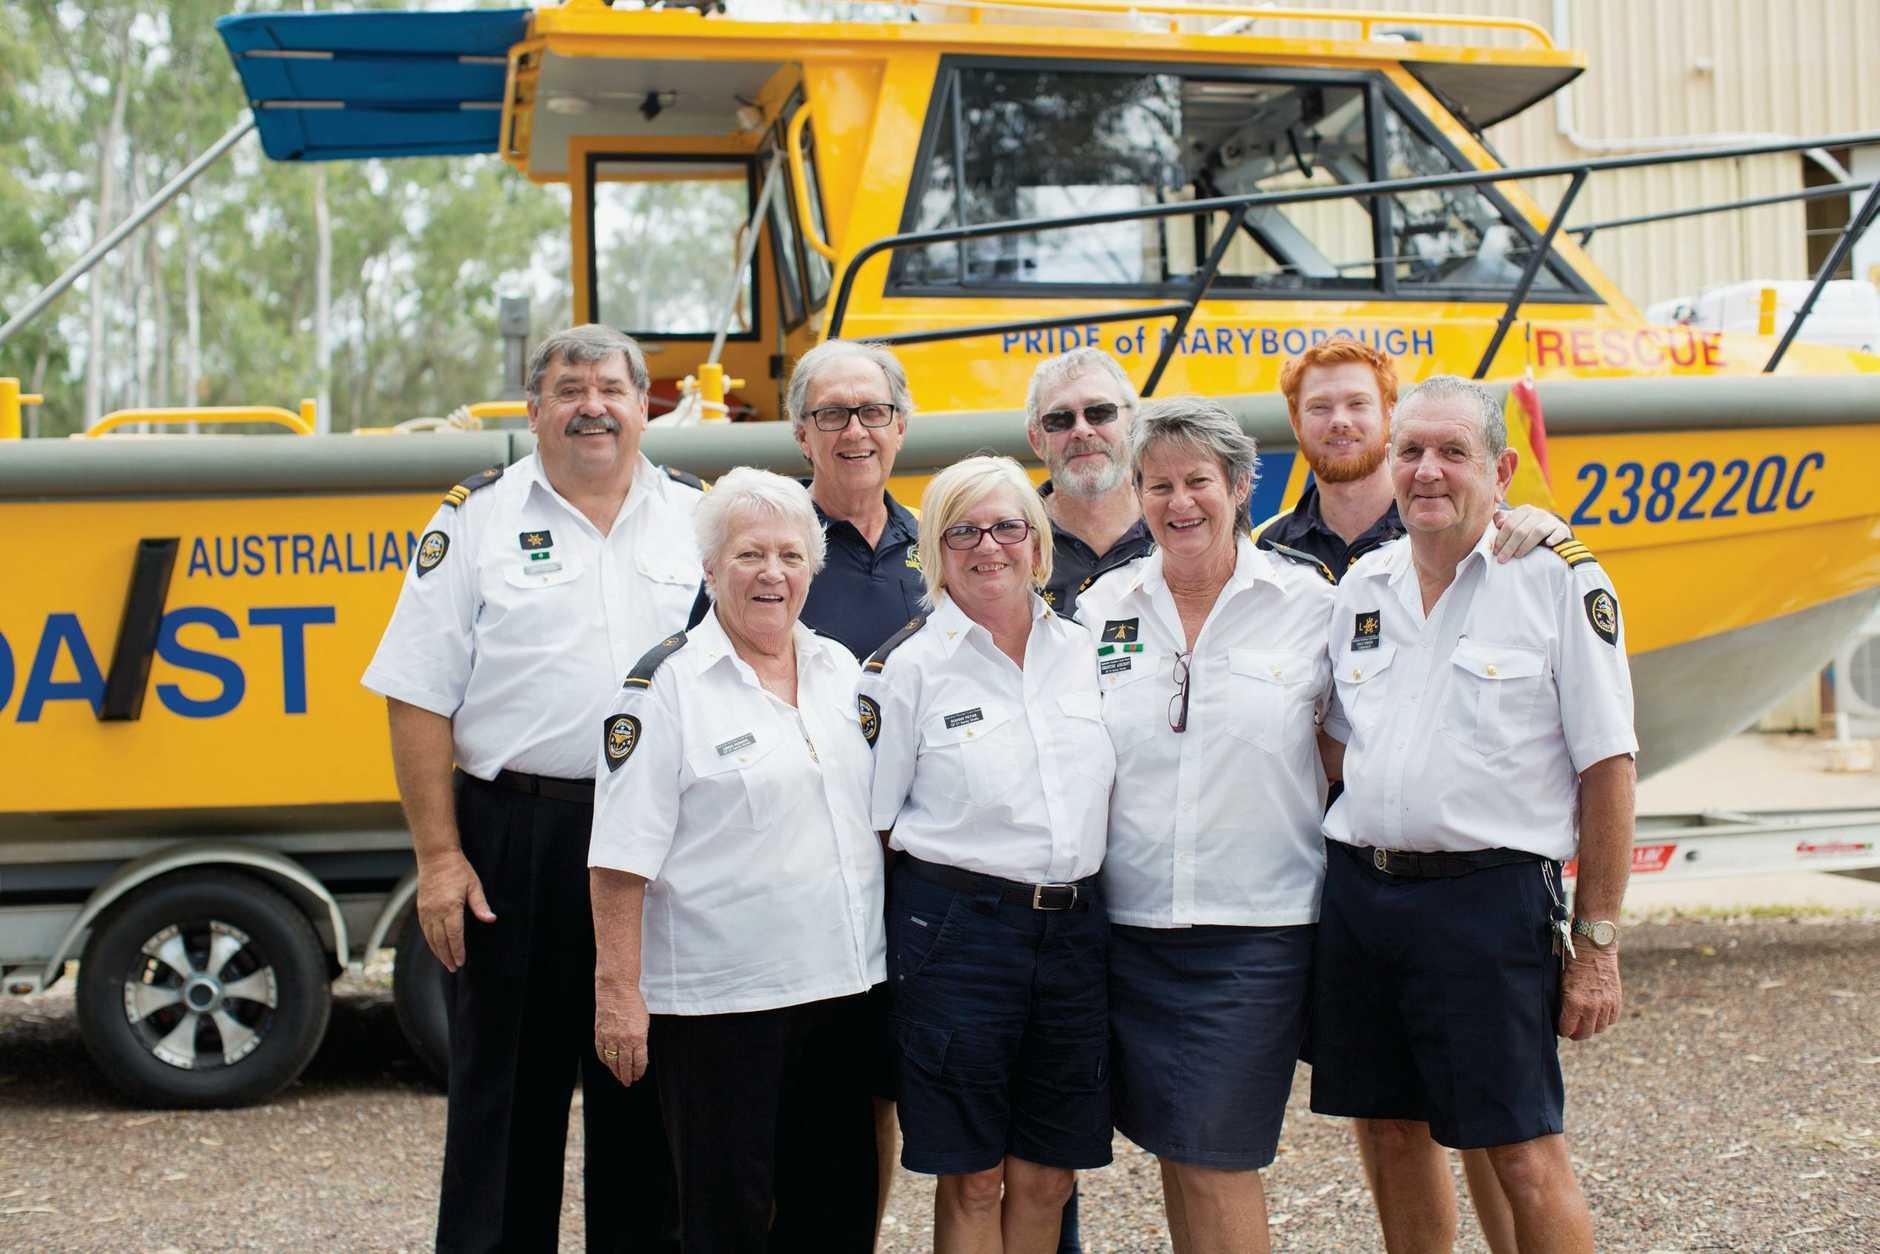 GUARDIANS: Back: John Scragg, Stuart Pryor, Murray Longland, Jesse Campbell. Front:Linda Scragg, Dianne Pryor, Chris Ashcroft, Dale Green,